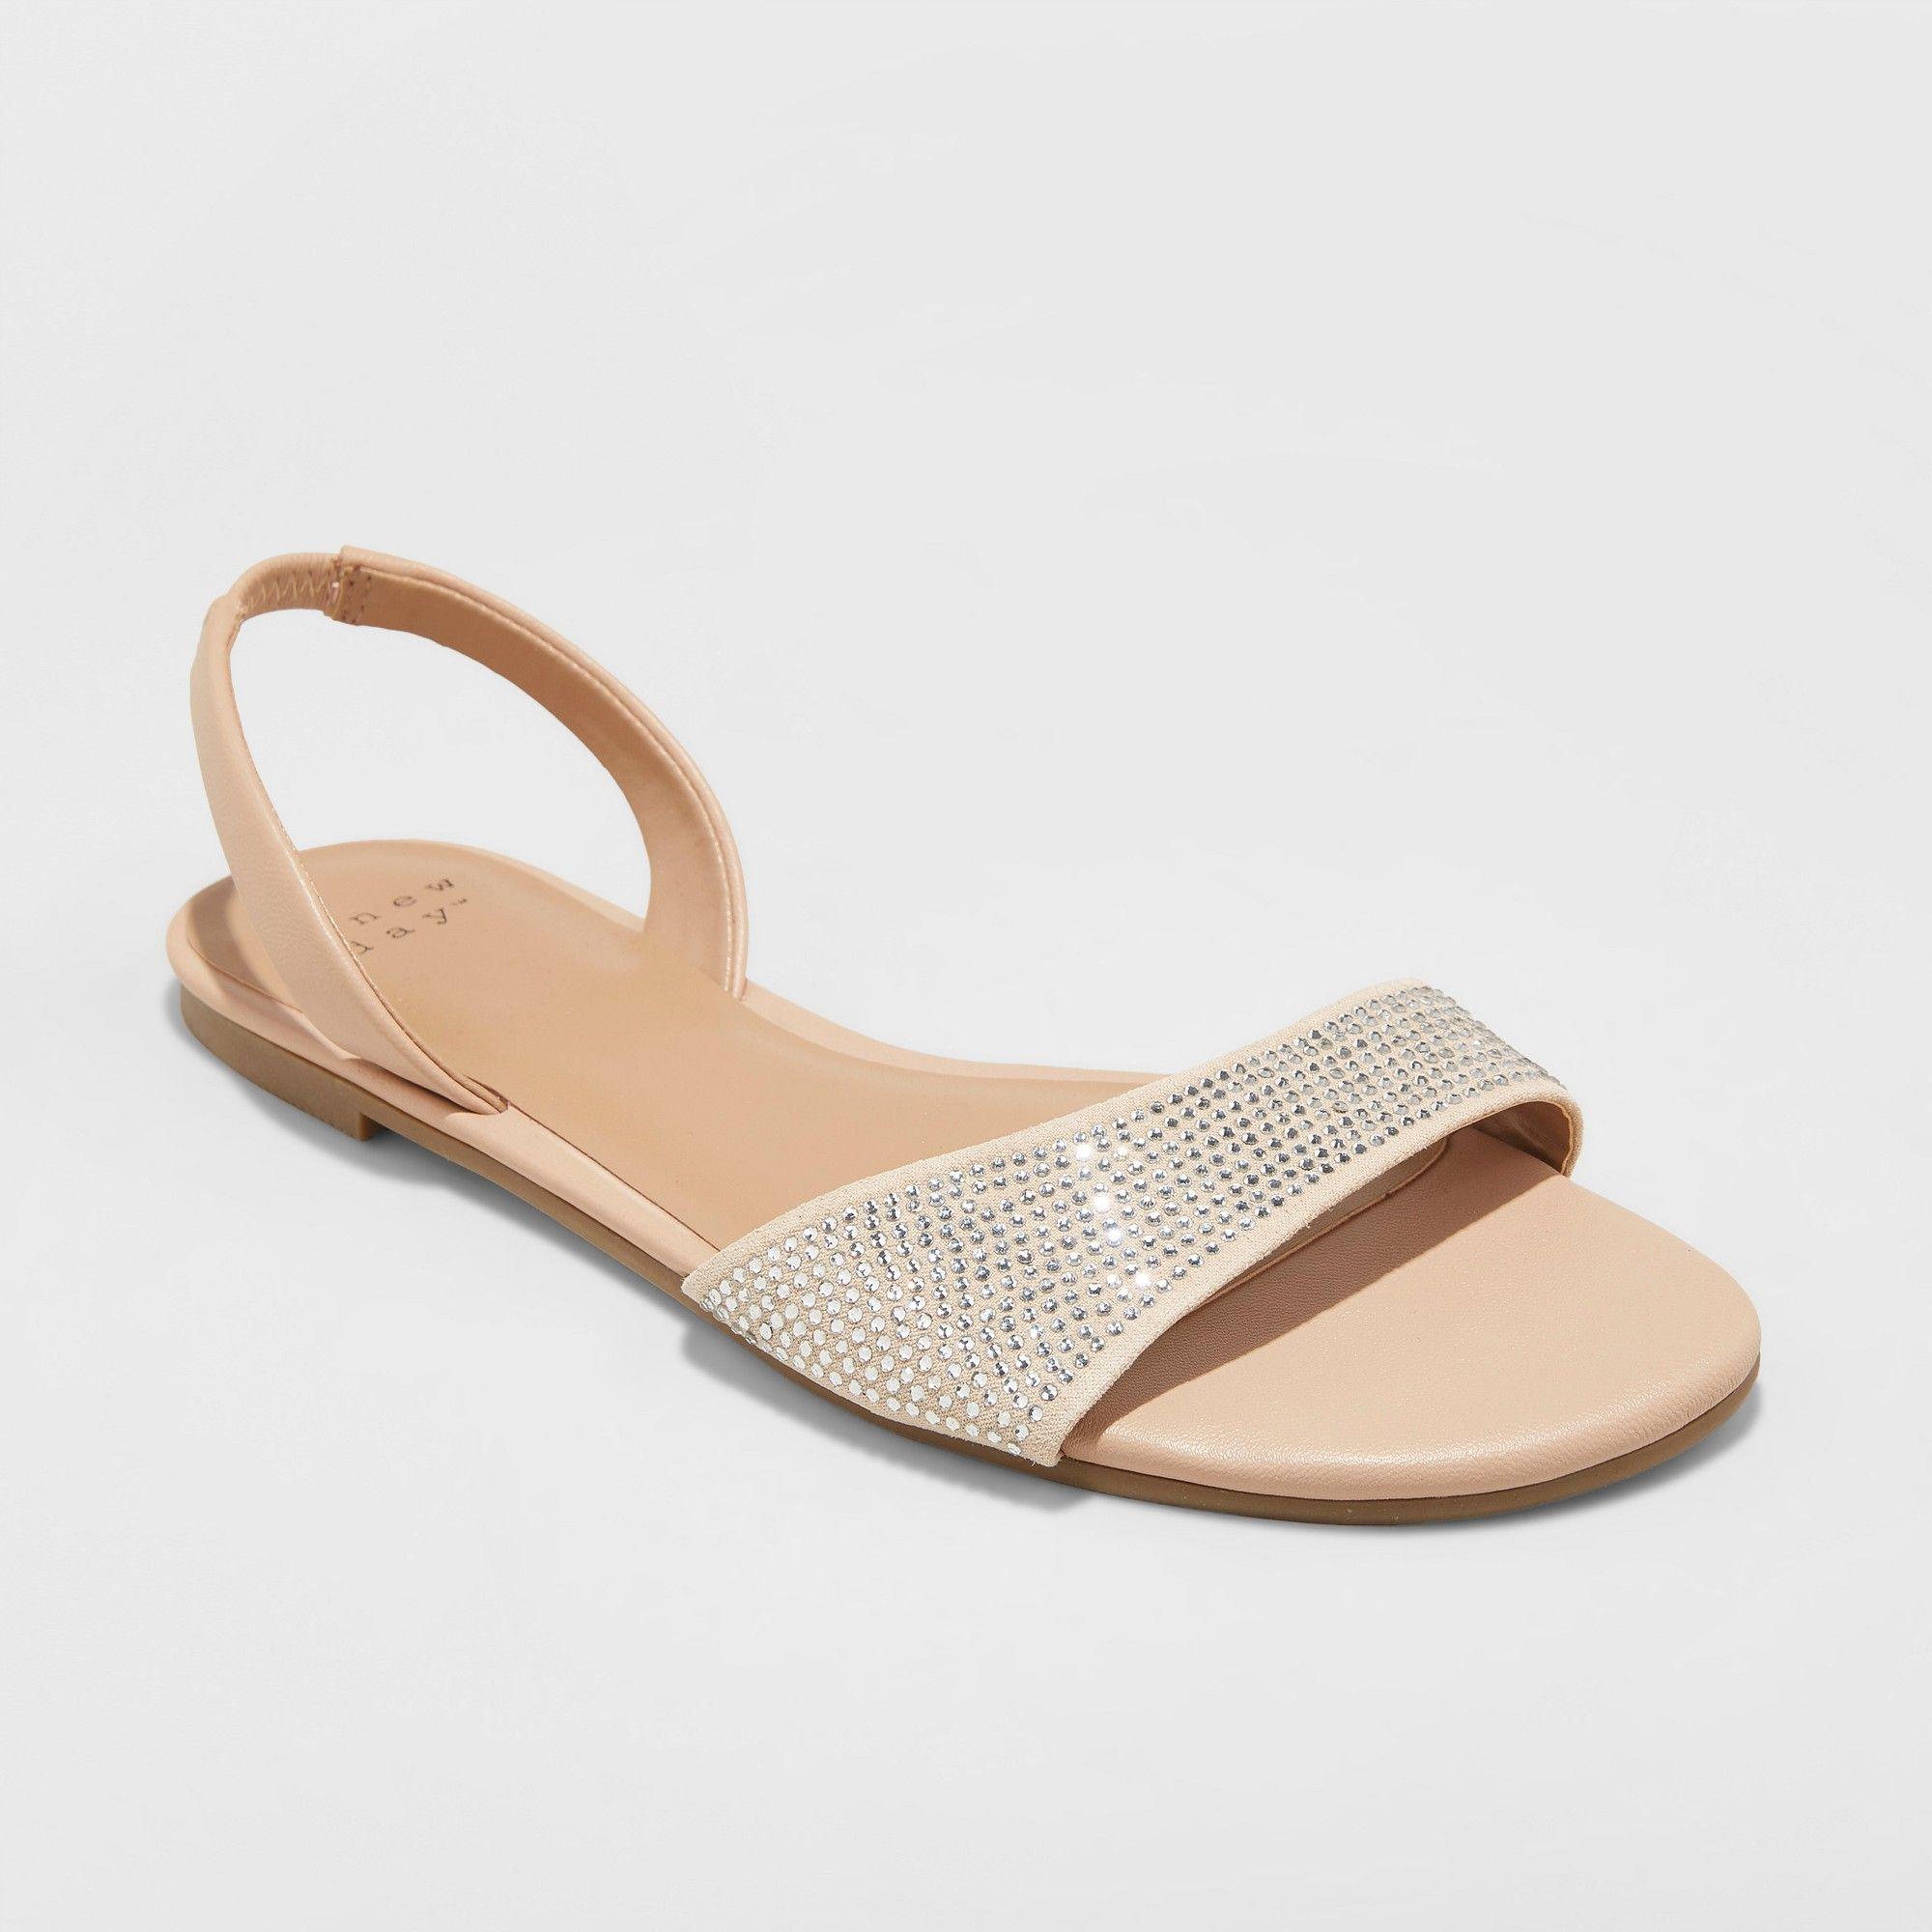 043620d22290 Women s Gabriella Embellished Slide Sandals - A New Day Gold 6 Slingback  Sandal